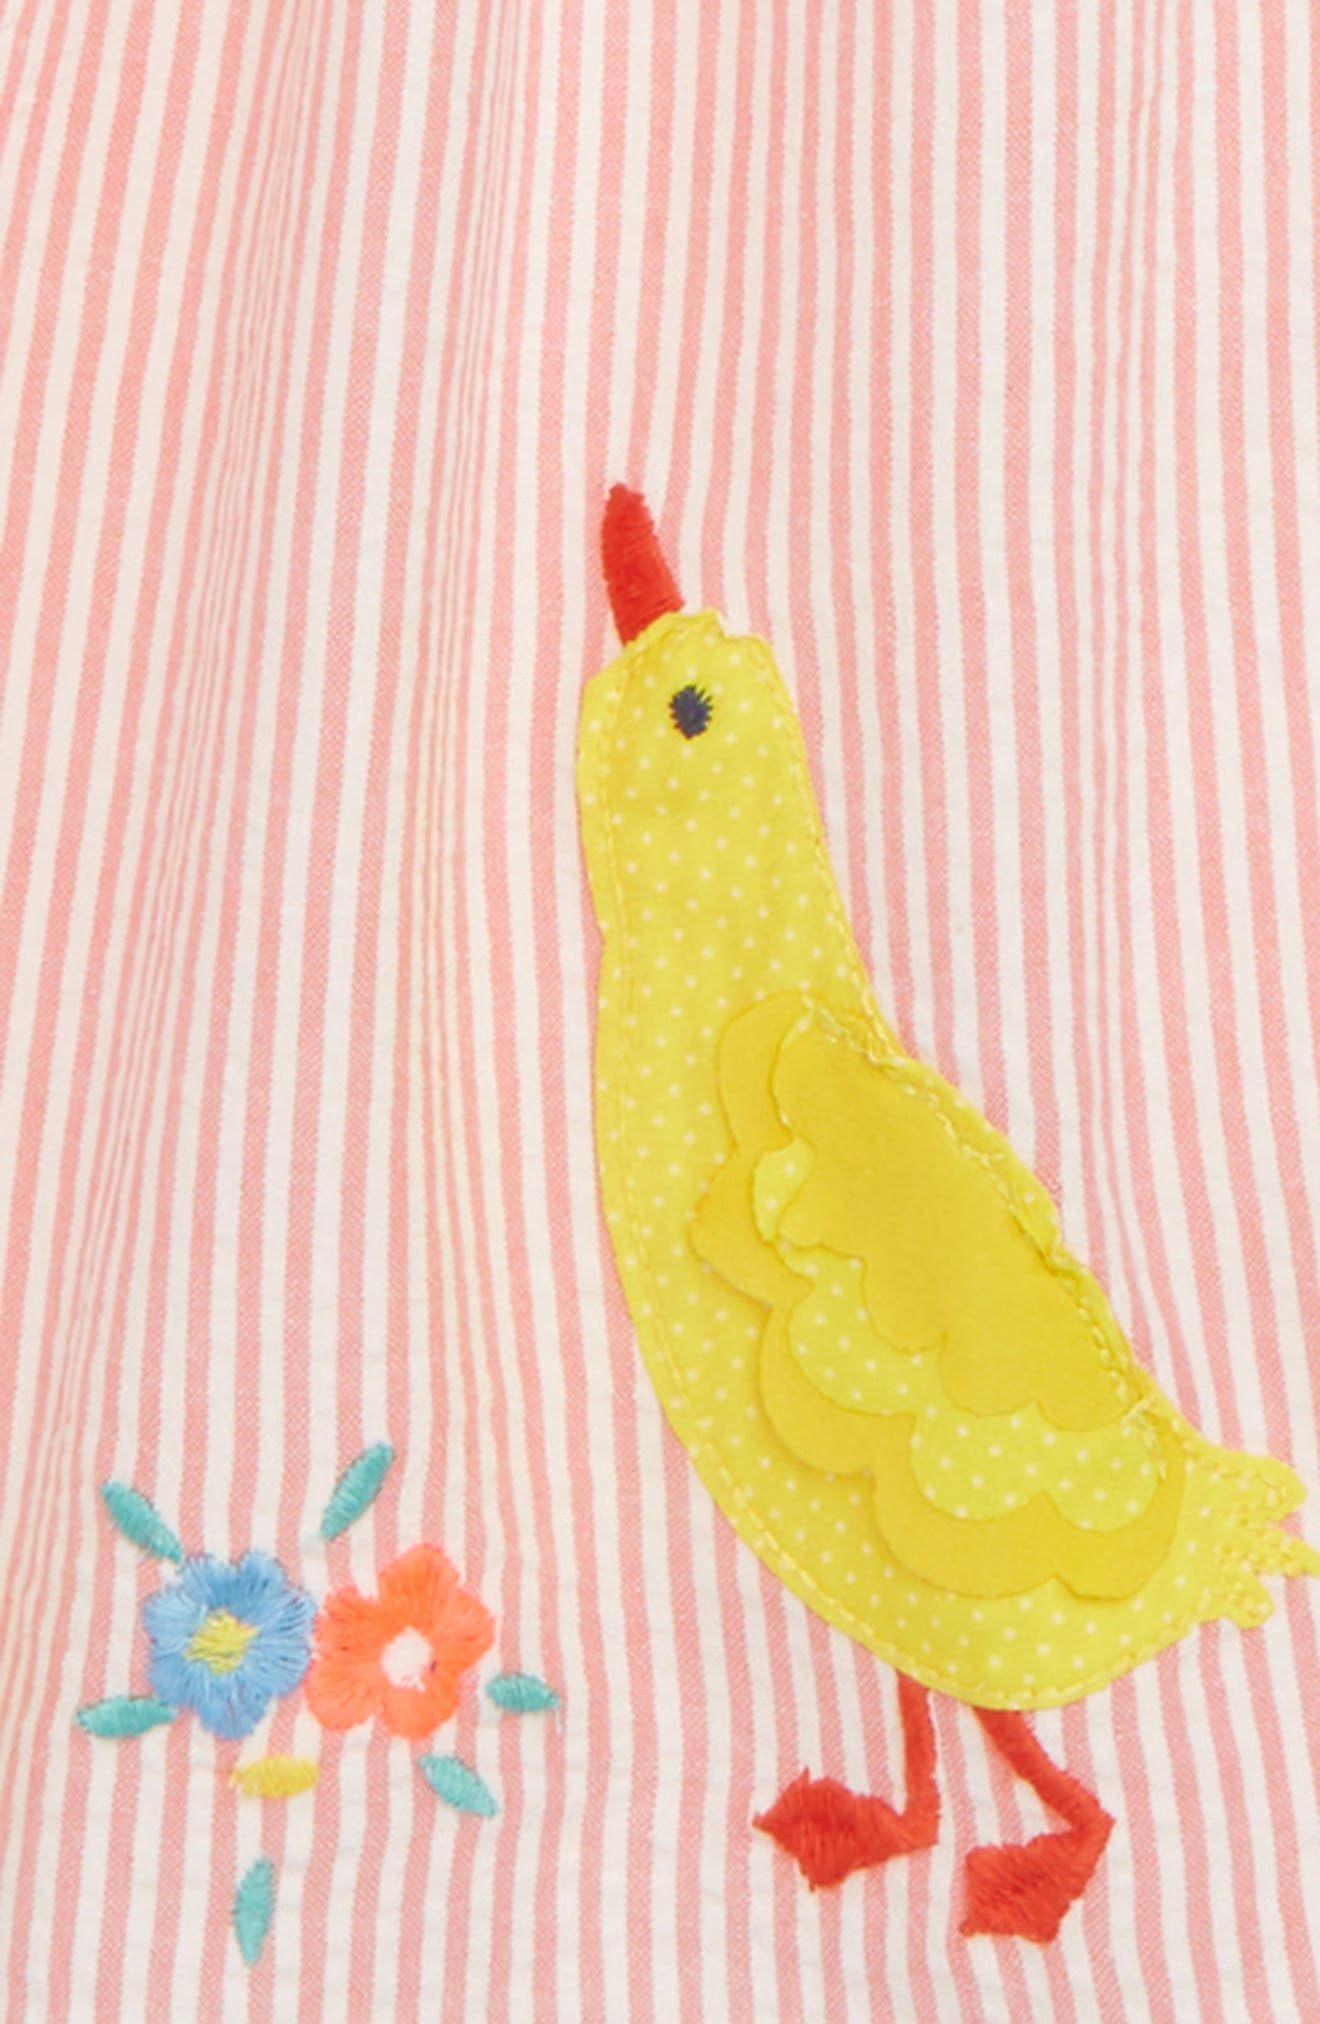 Smocked Chick Appliqué Dress,                             Alternate thumbnail 2, color,                             Crab Apple/ Pink Duck